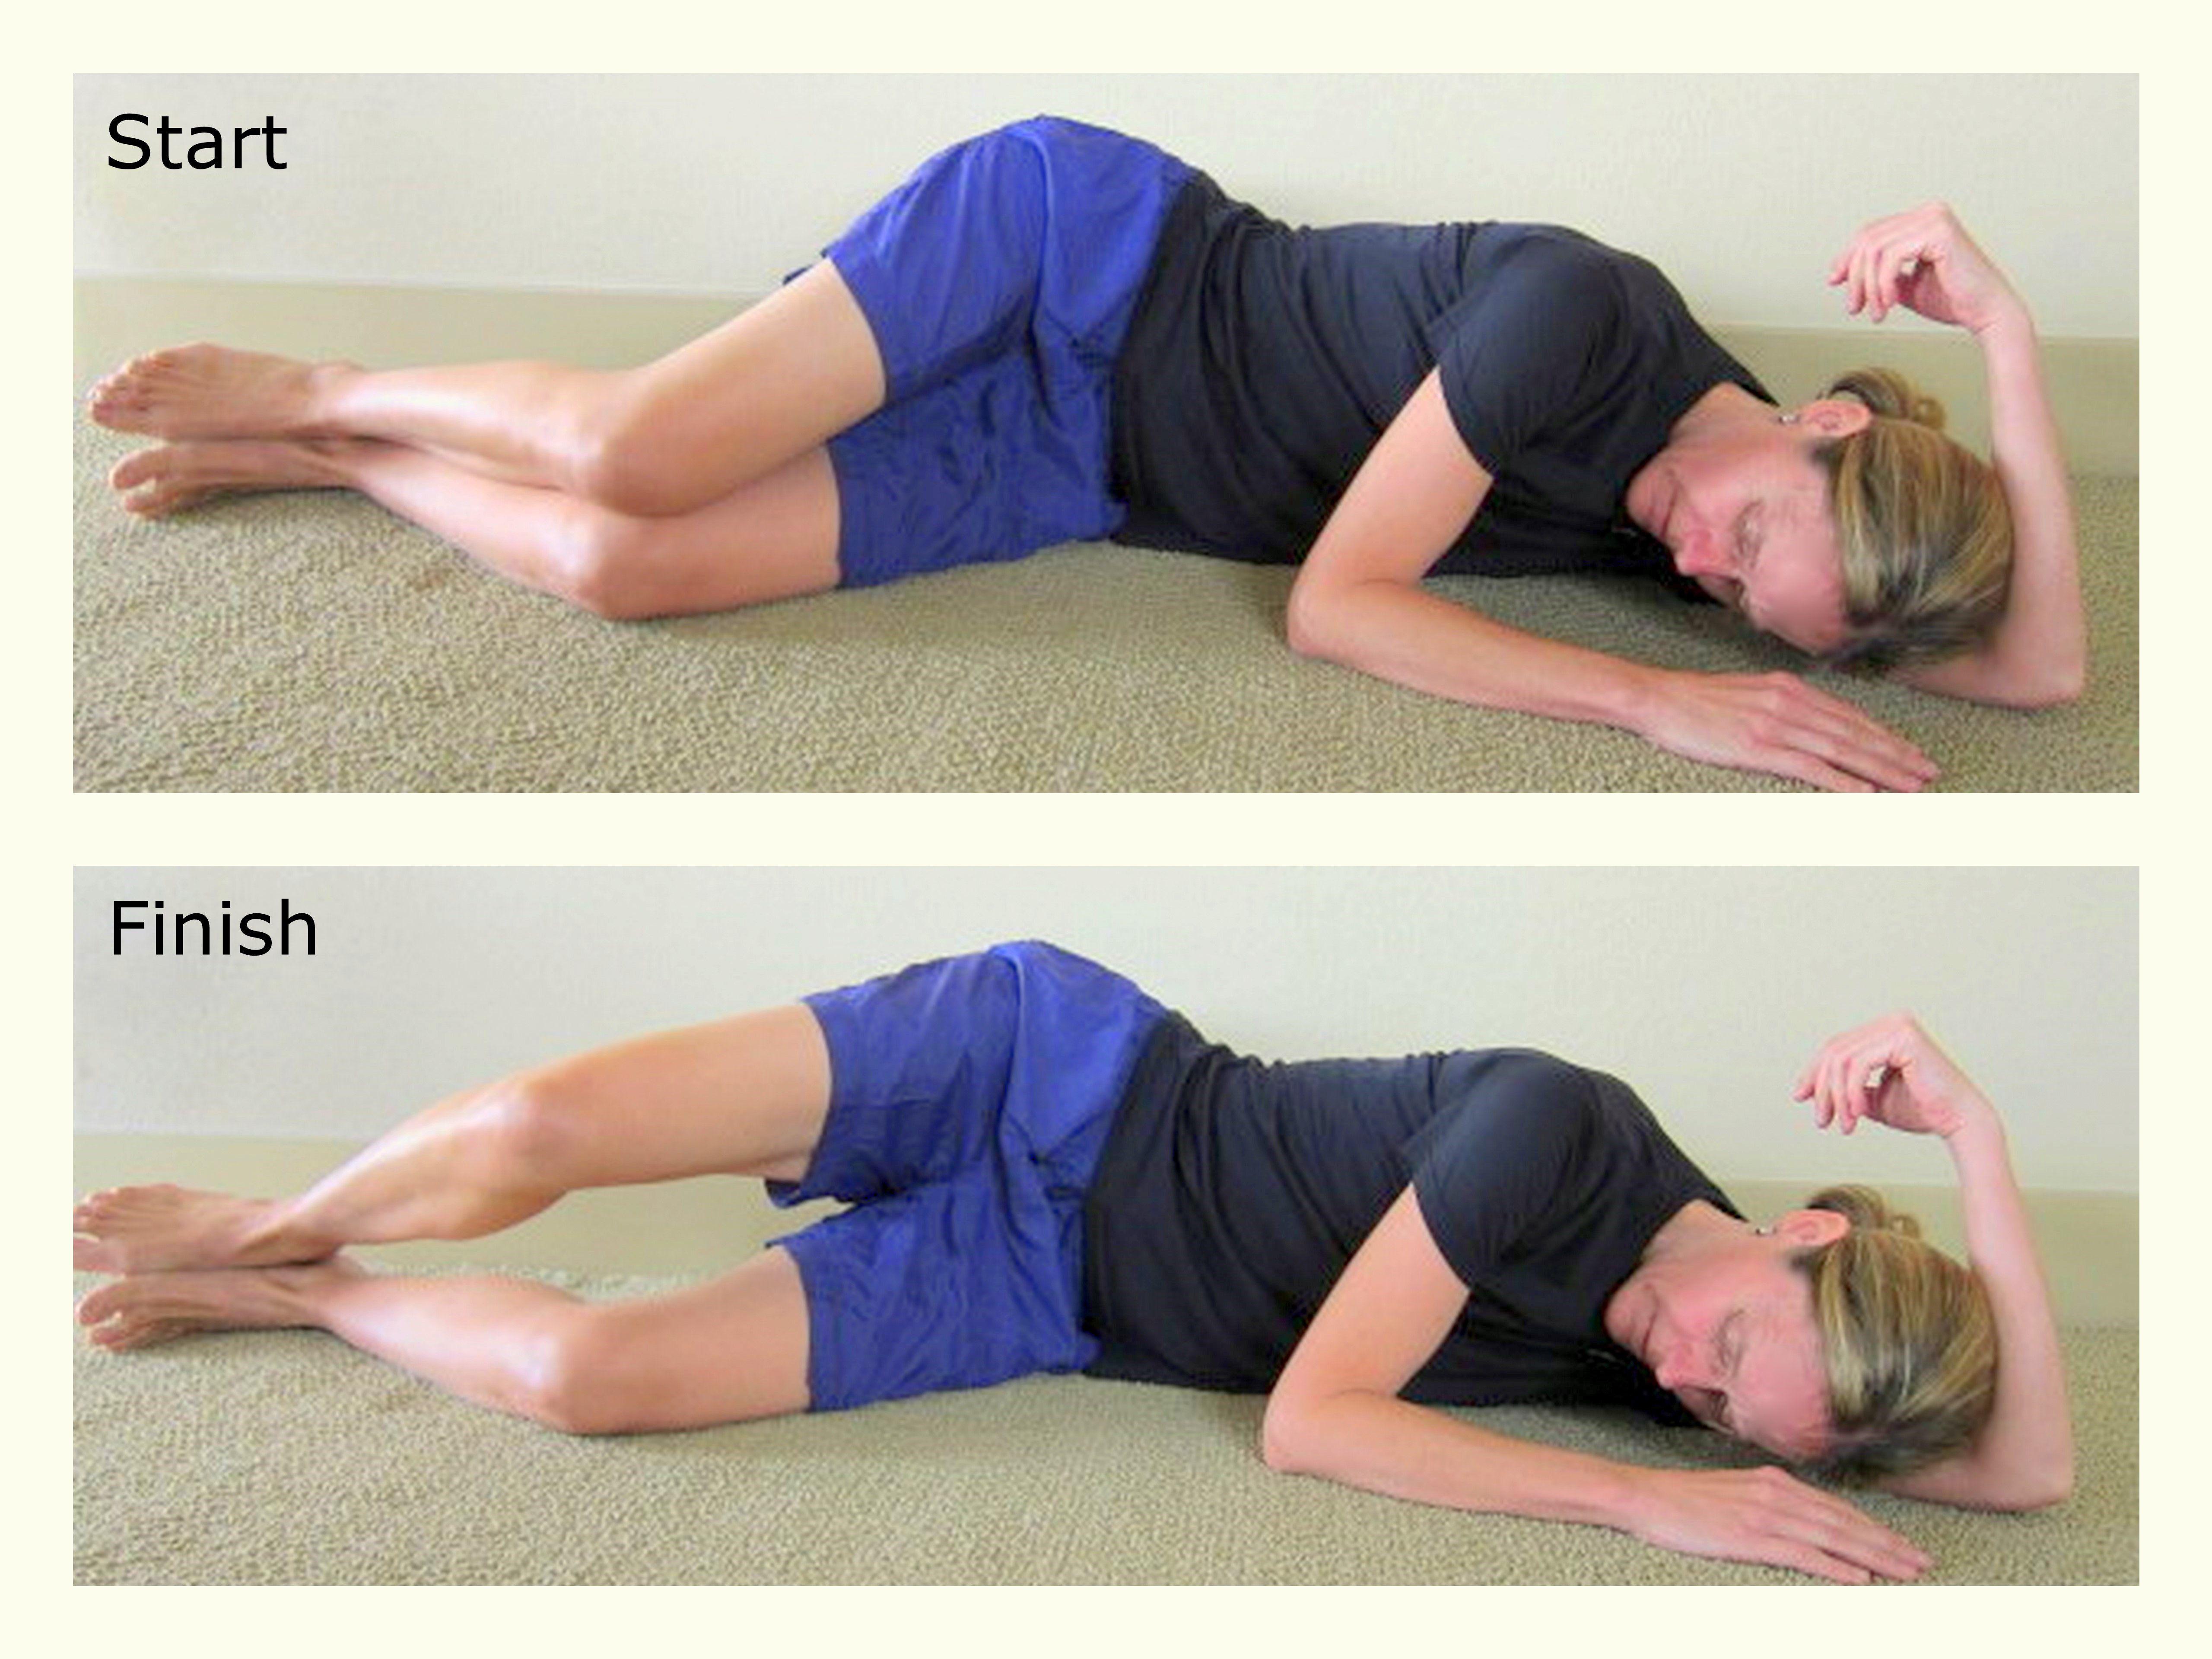 Clam Exercise - glute medius activation exercise